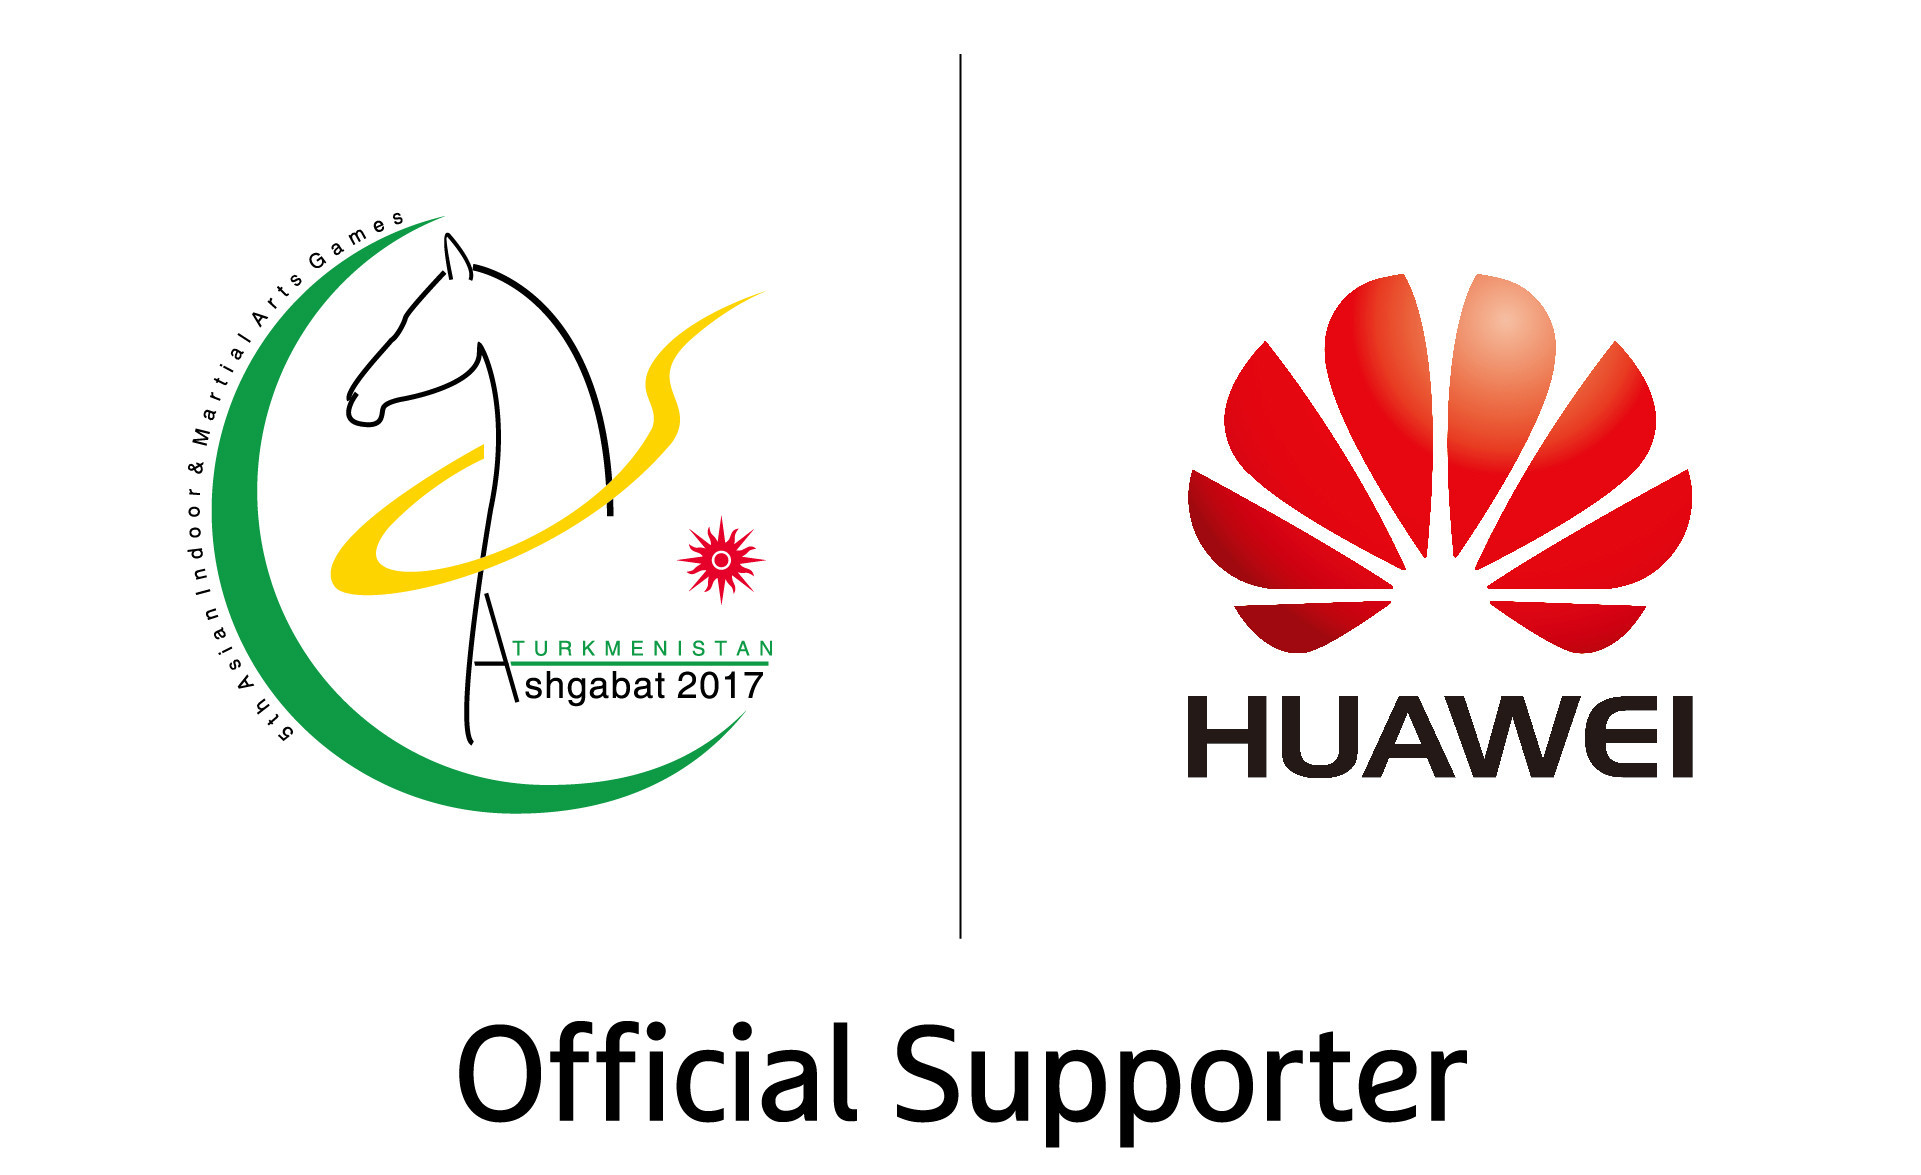 Huawei has signed a deal with Ashgabat 2017 ©Ashgabat 2017